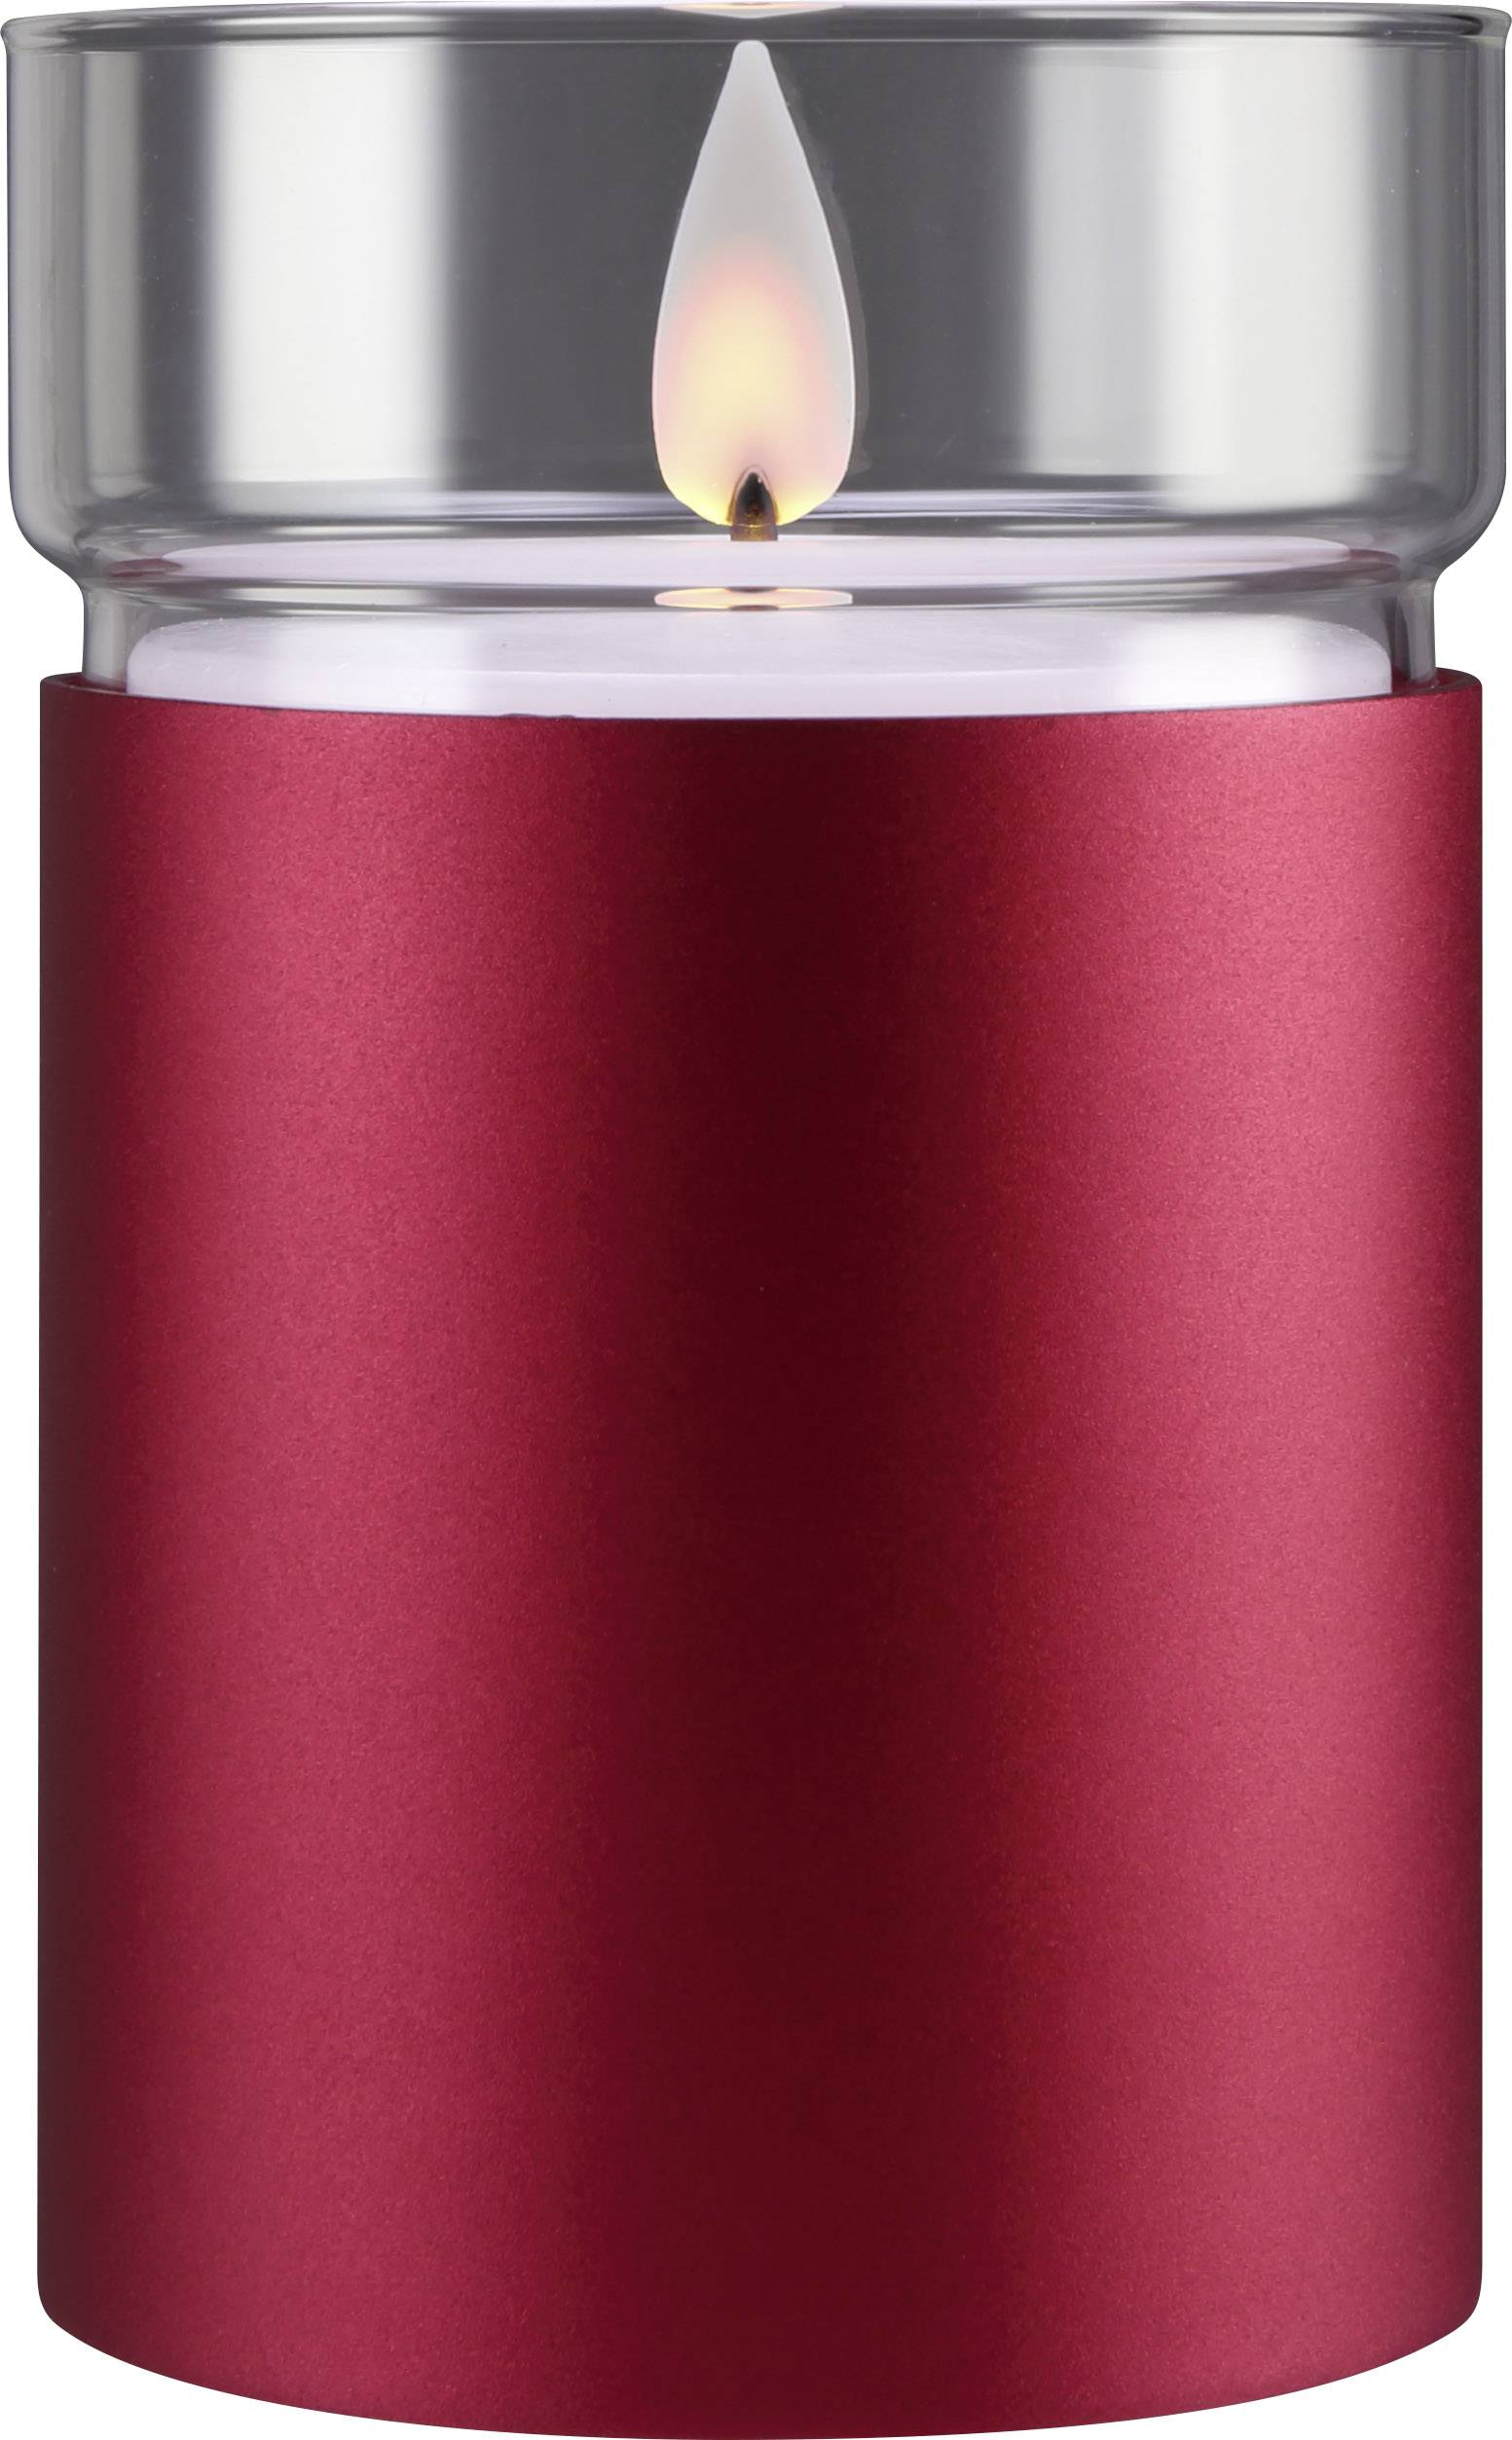 LED vosková svíčka Polarlite (Ø x v) 80 mm x 120 mm, vínově červená, teplá bílá